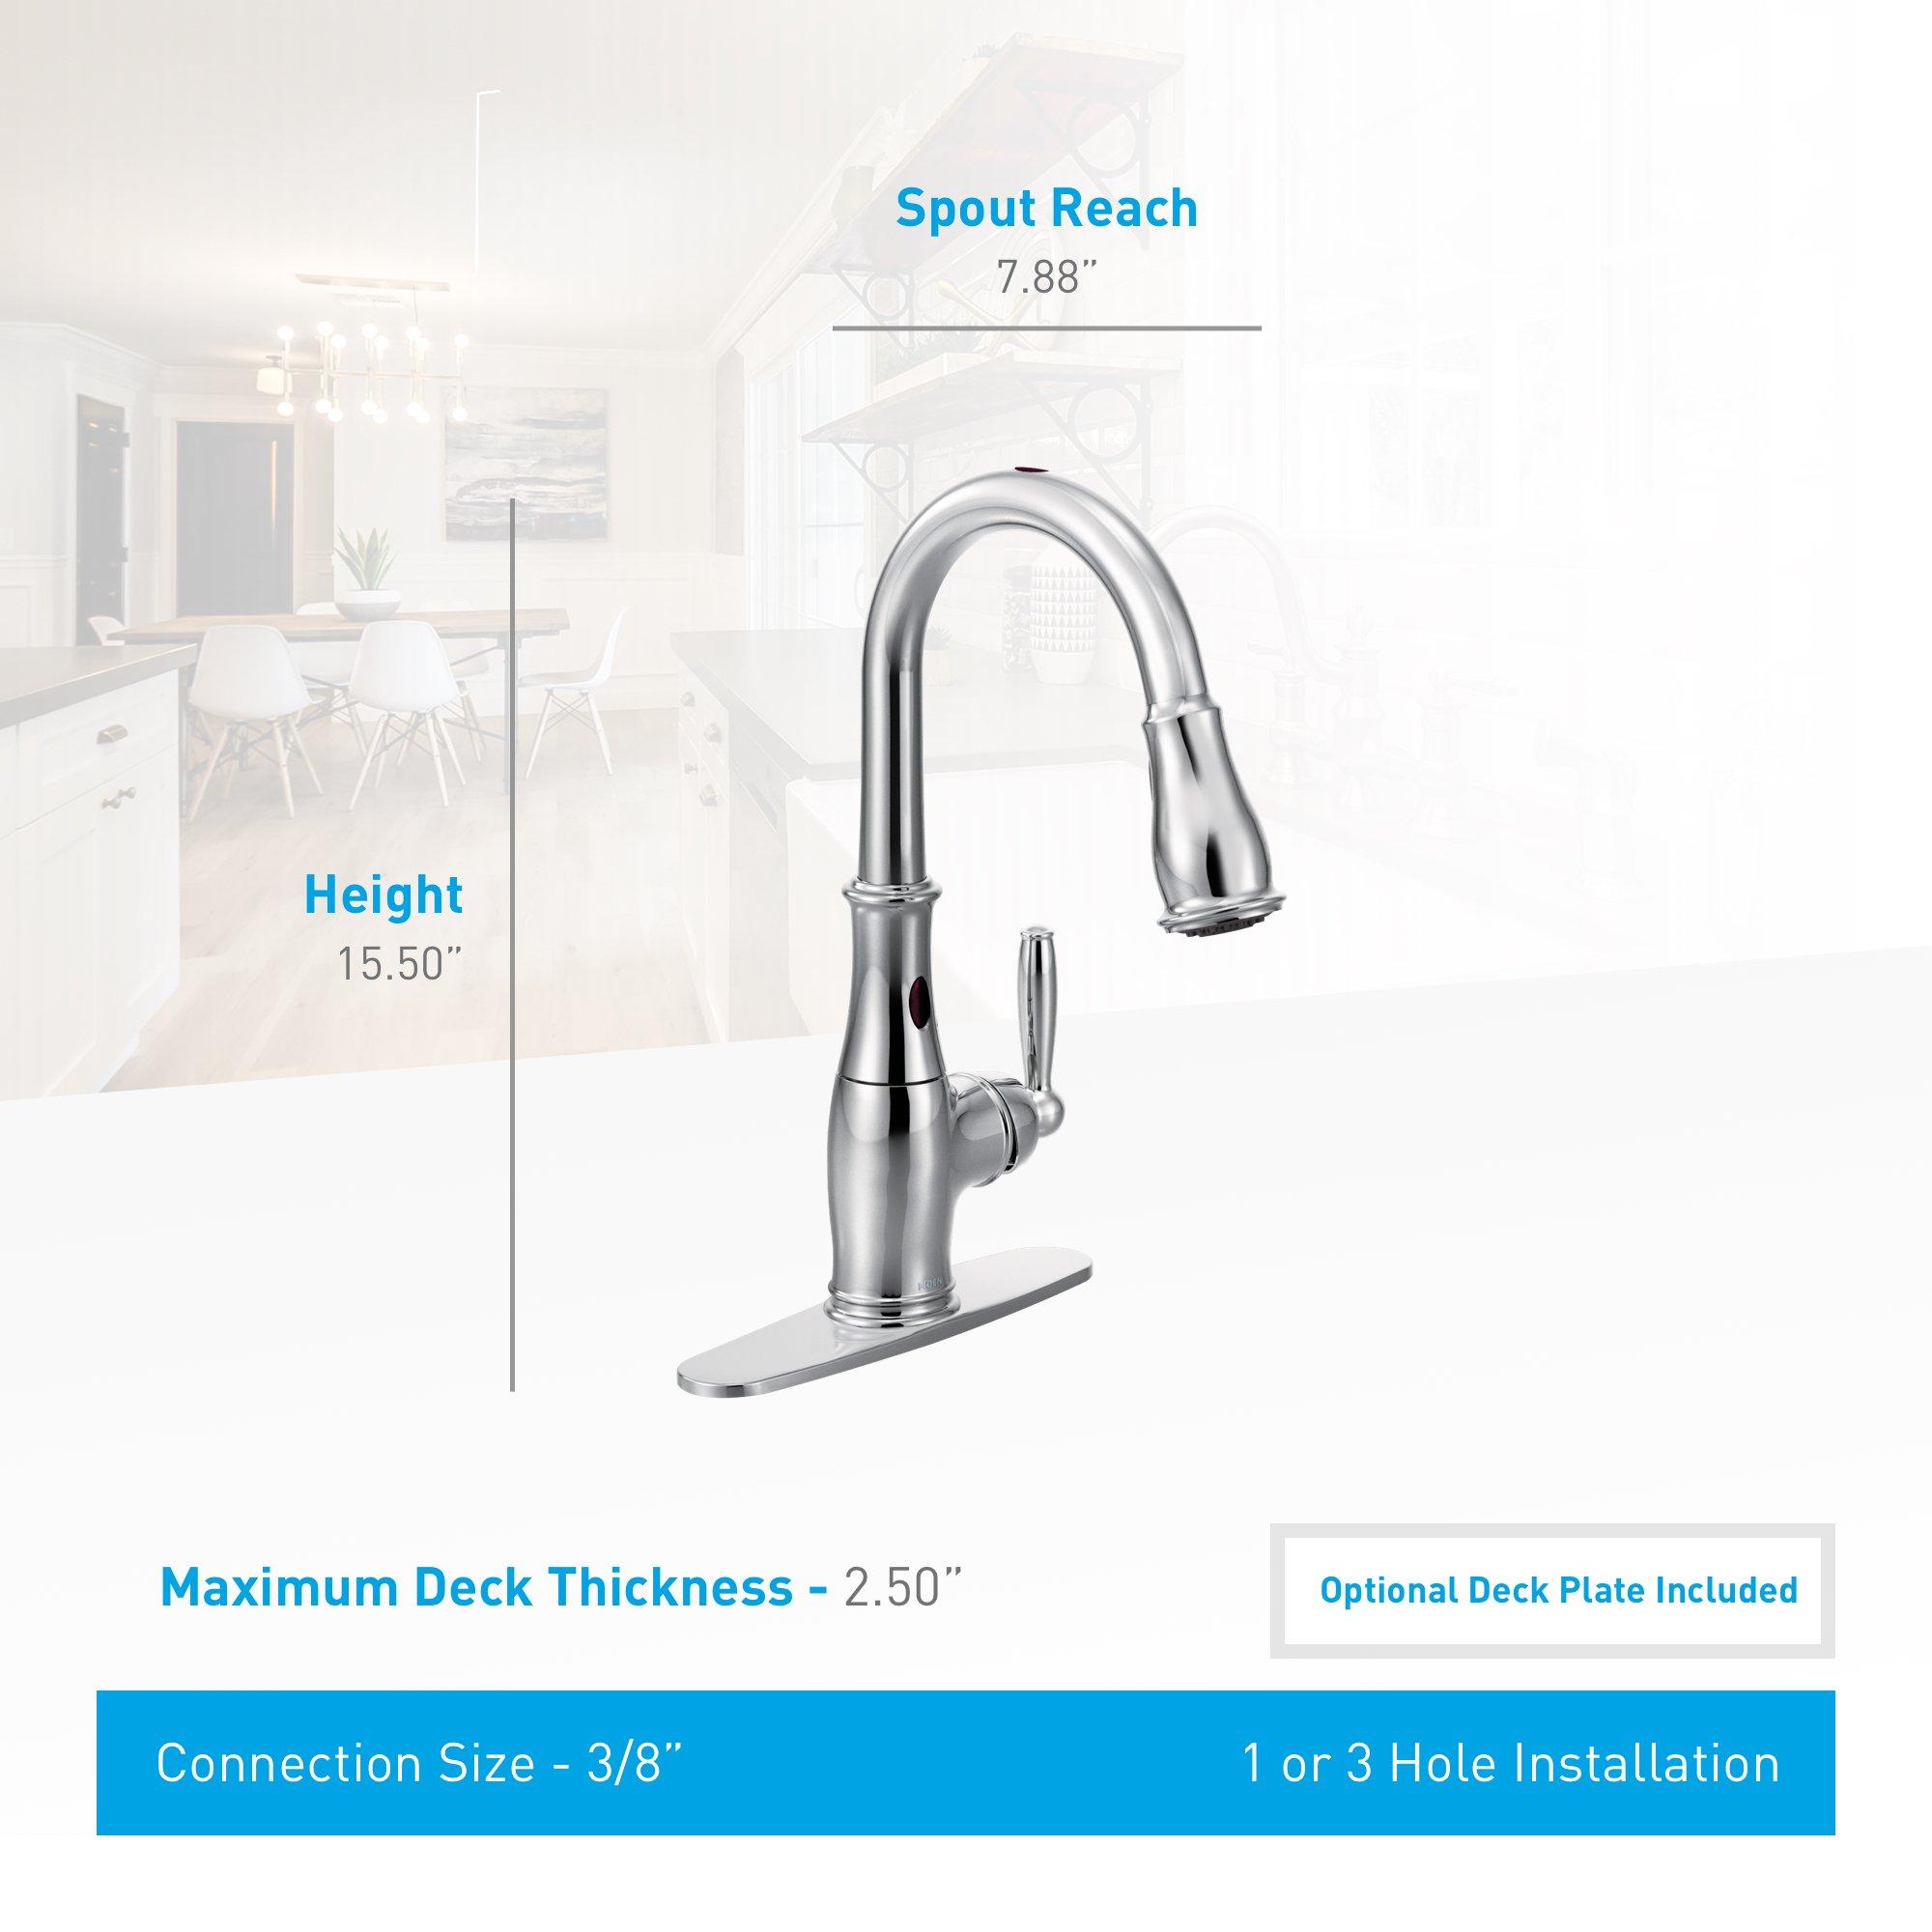 Moen Motionsense Kitchen Faucet: Moen Brantford Motionsense Touchless One-Handle High-Arc